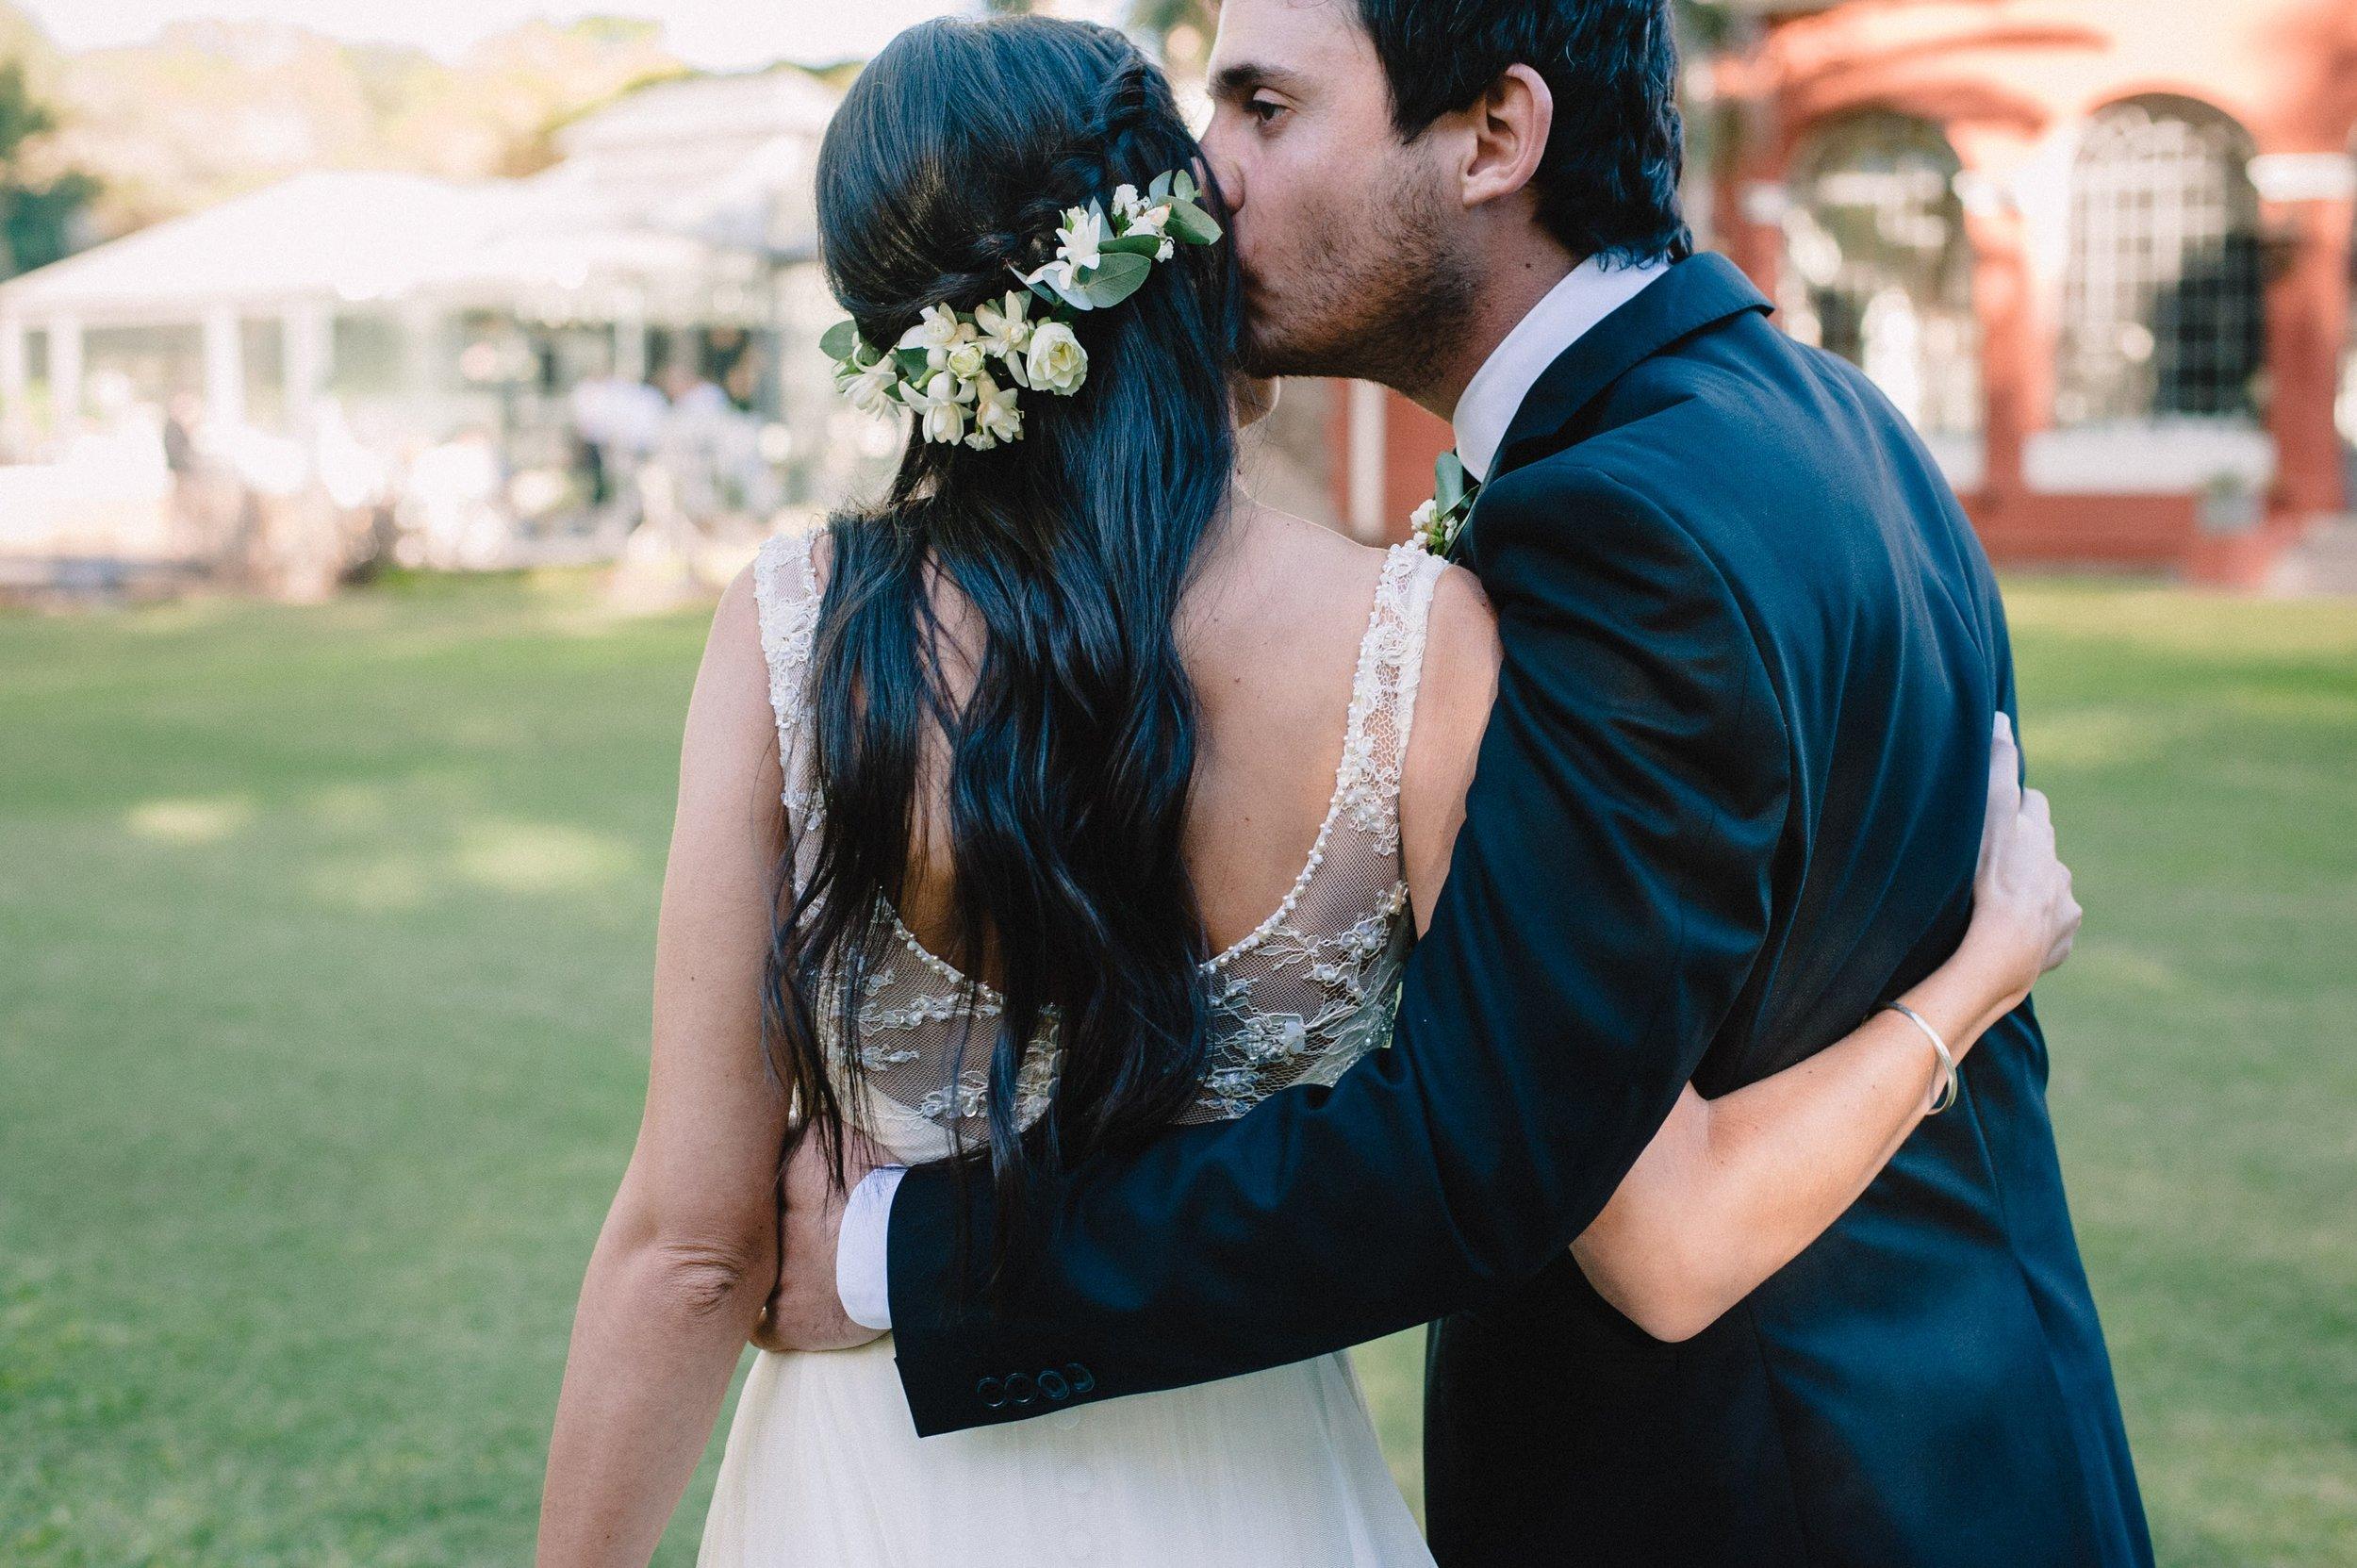 fotografo de bodas en carlos paz cordoba 063.JPG